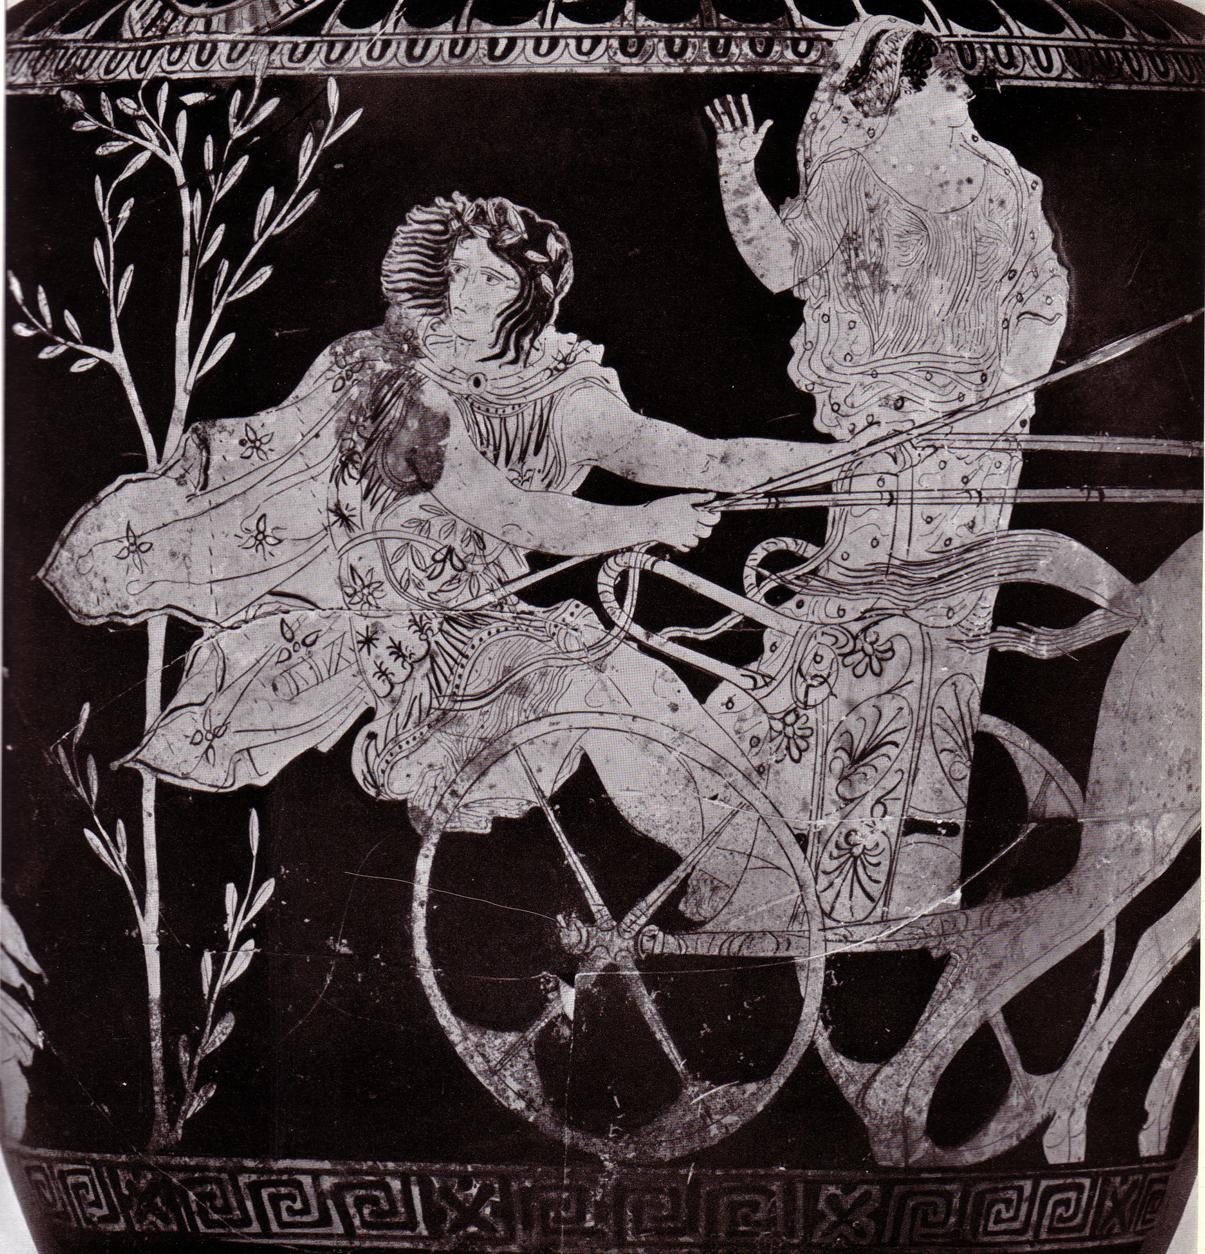 chariot race scene